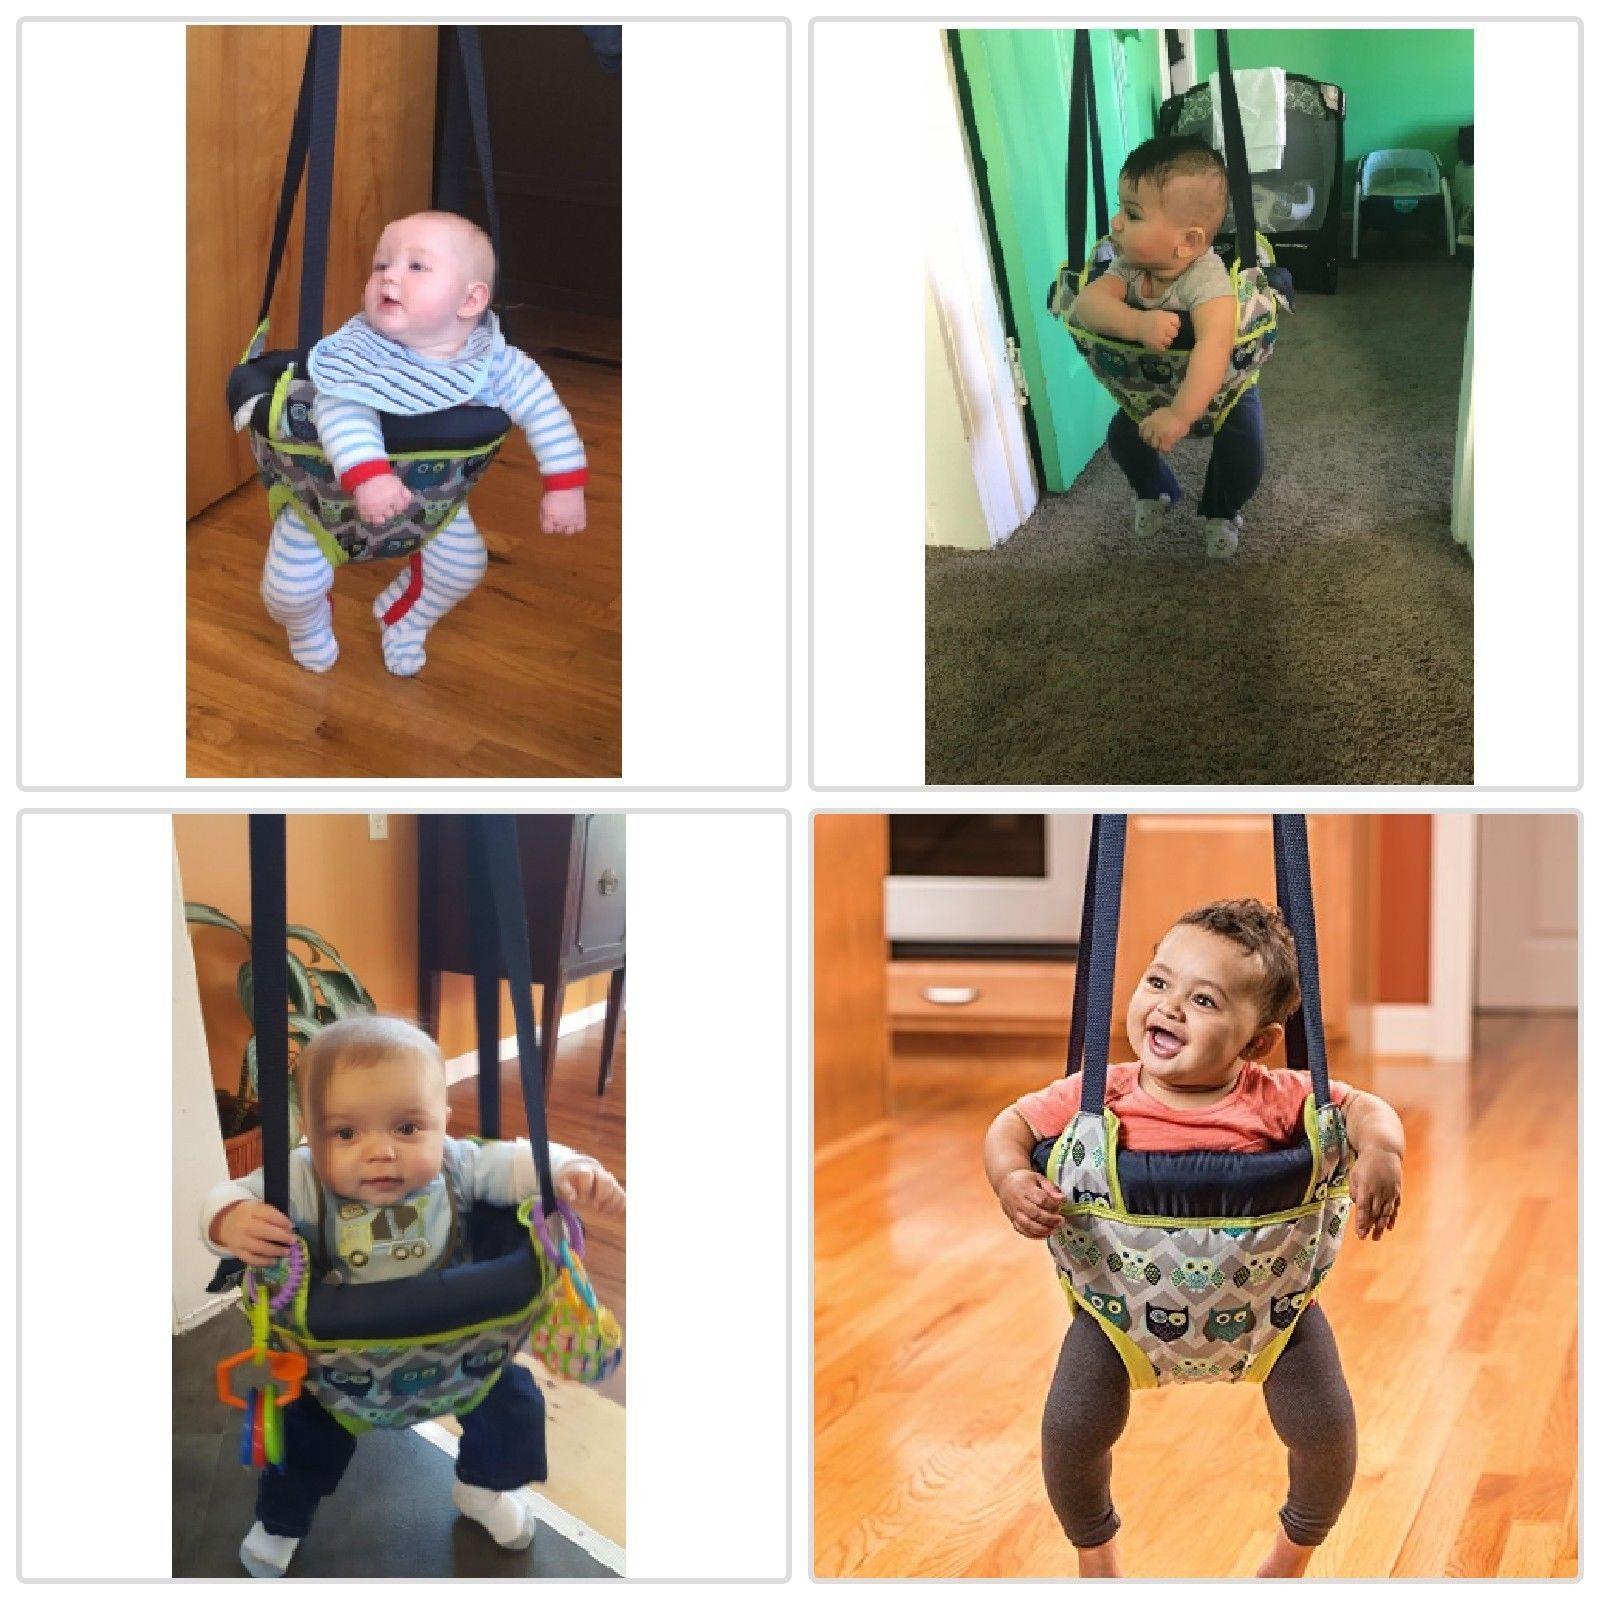 1fe17eb4dde1 Details about New Evenflo Exersaucer Door Jumper Owl Baby Toddler ...